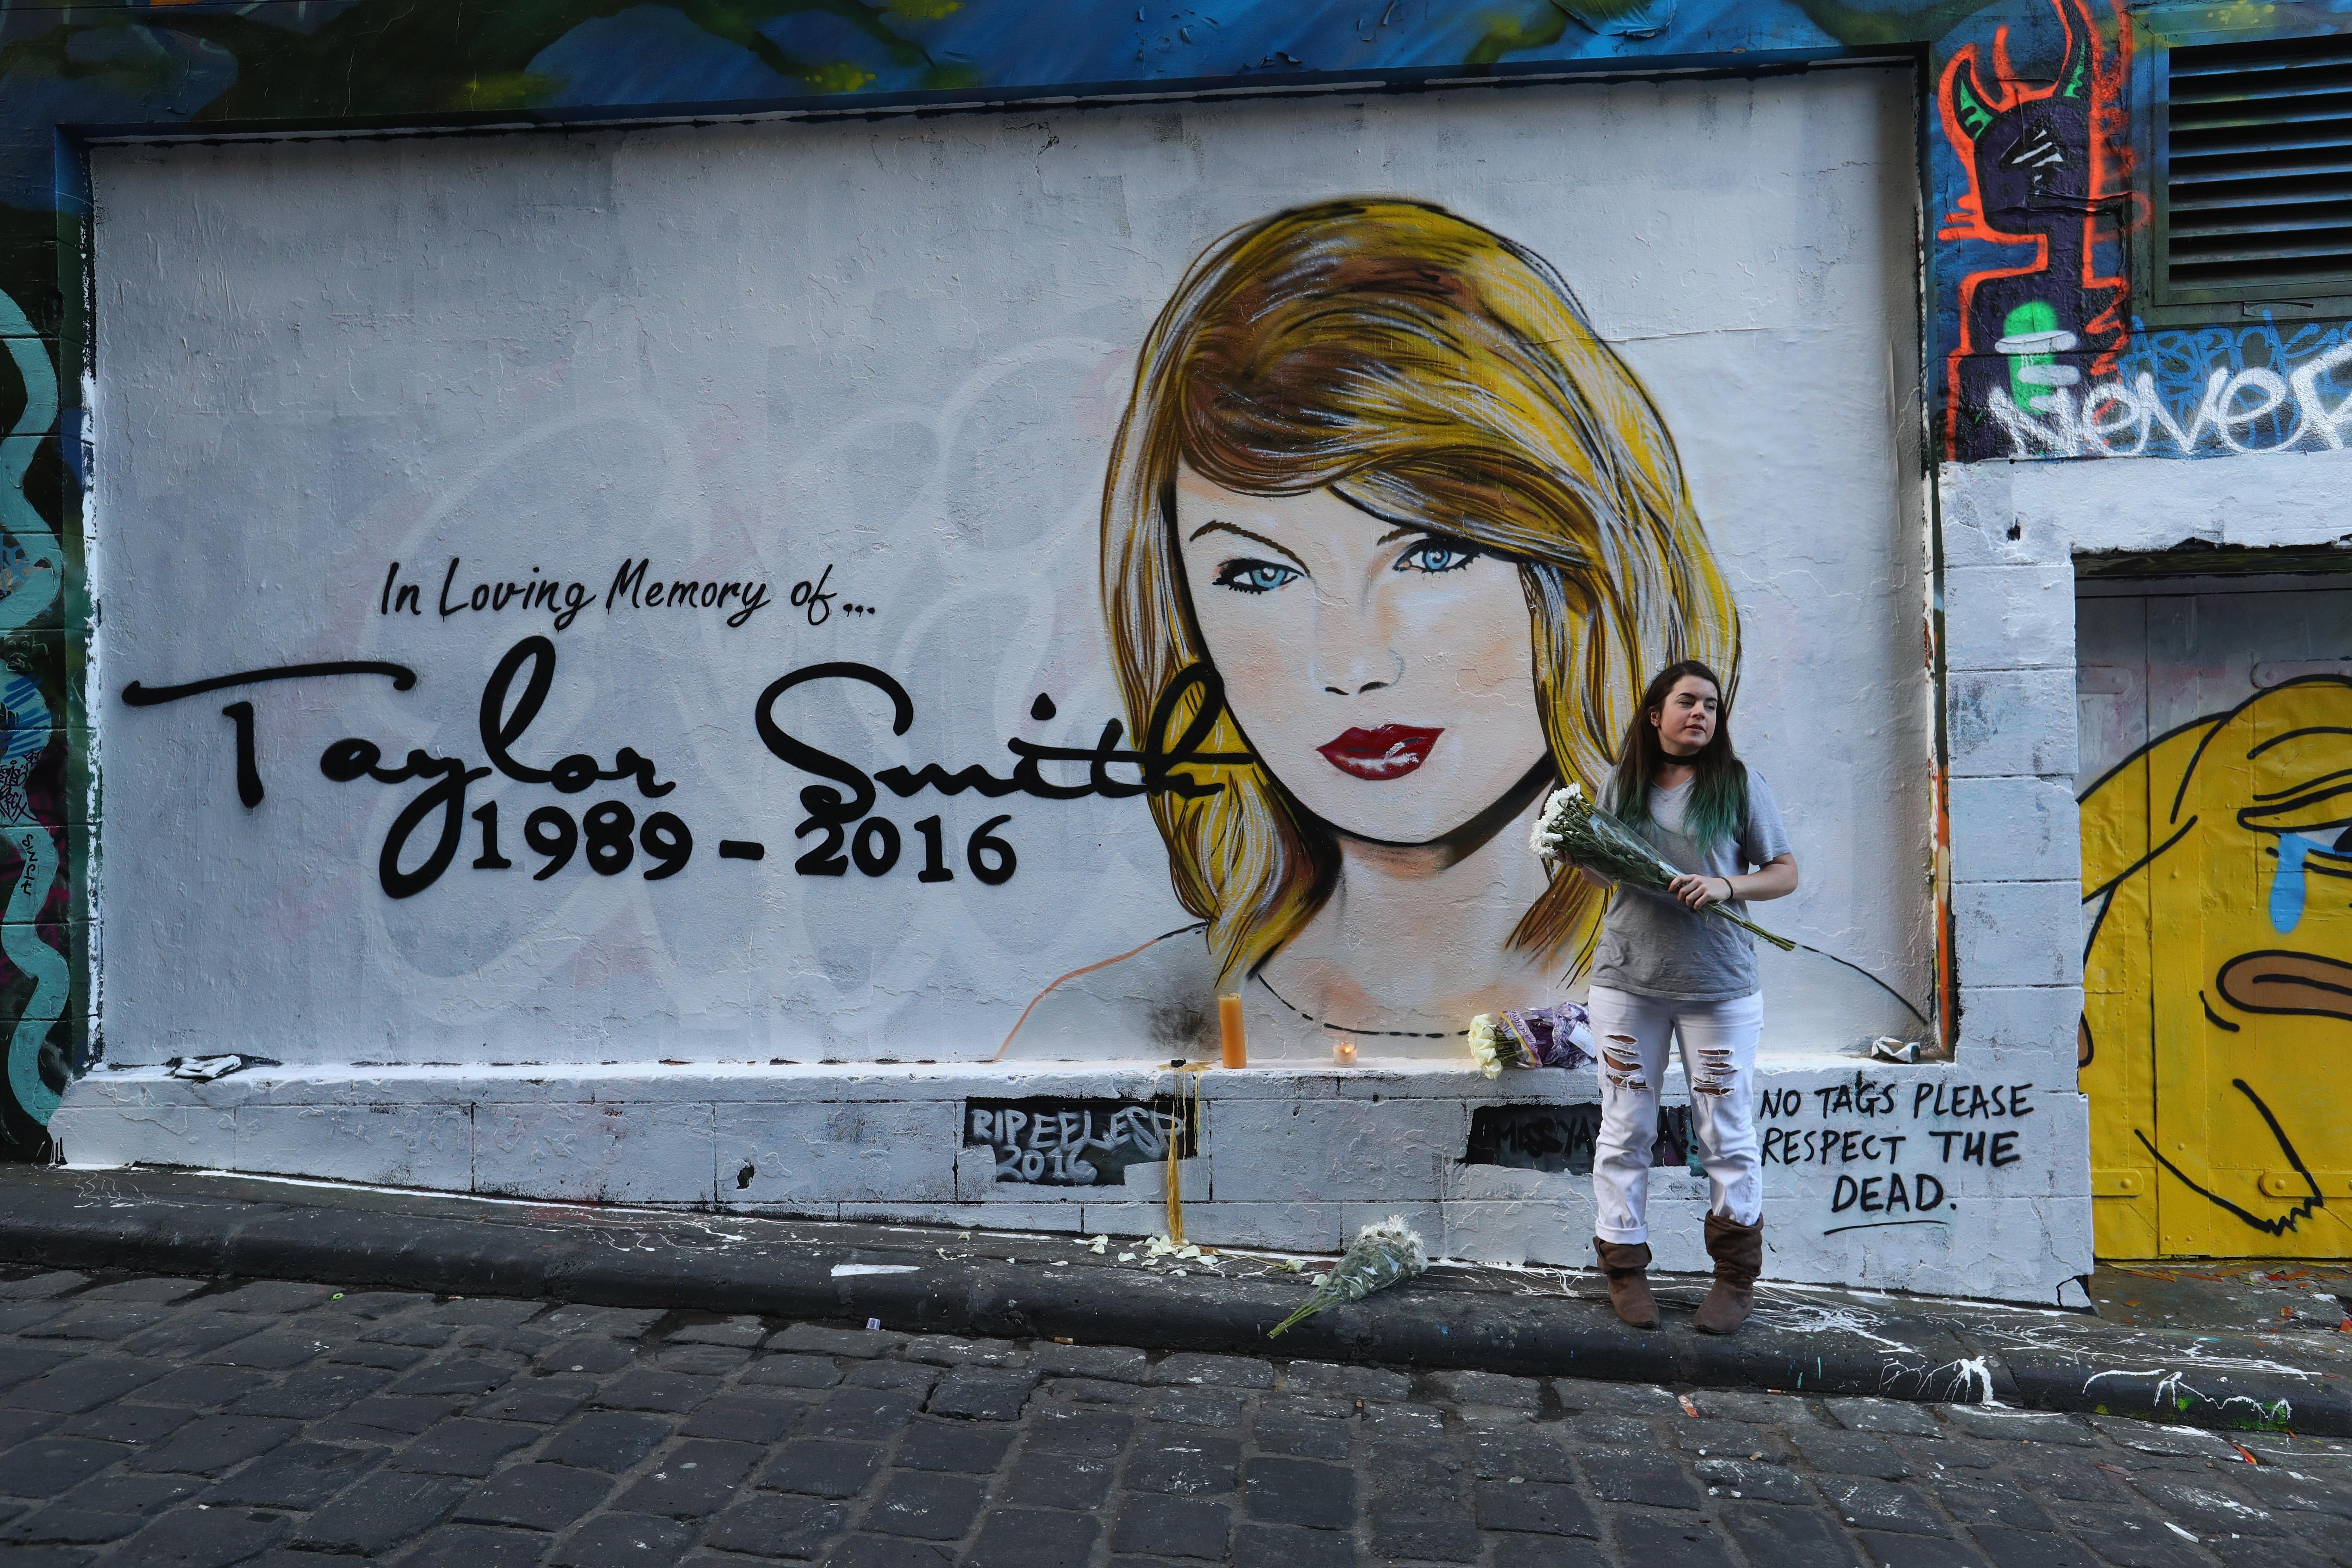 Giant 'RIP Taylor Swift' Mural Appears In Melbourne's Hosier Lane